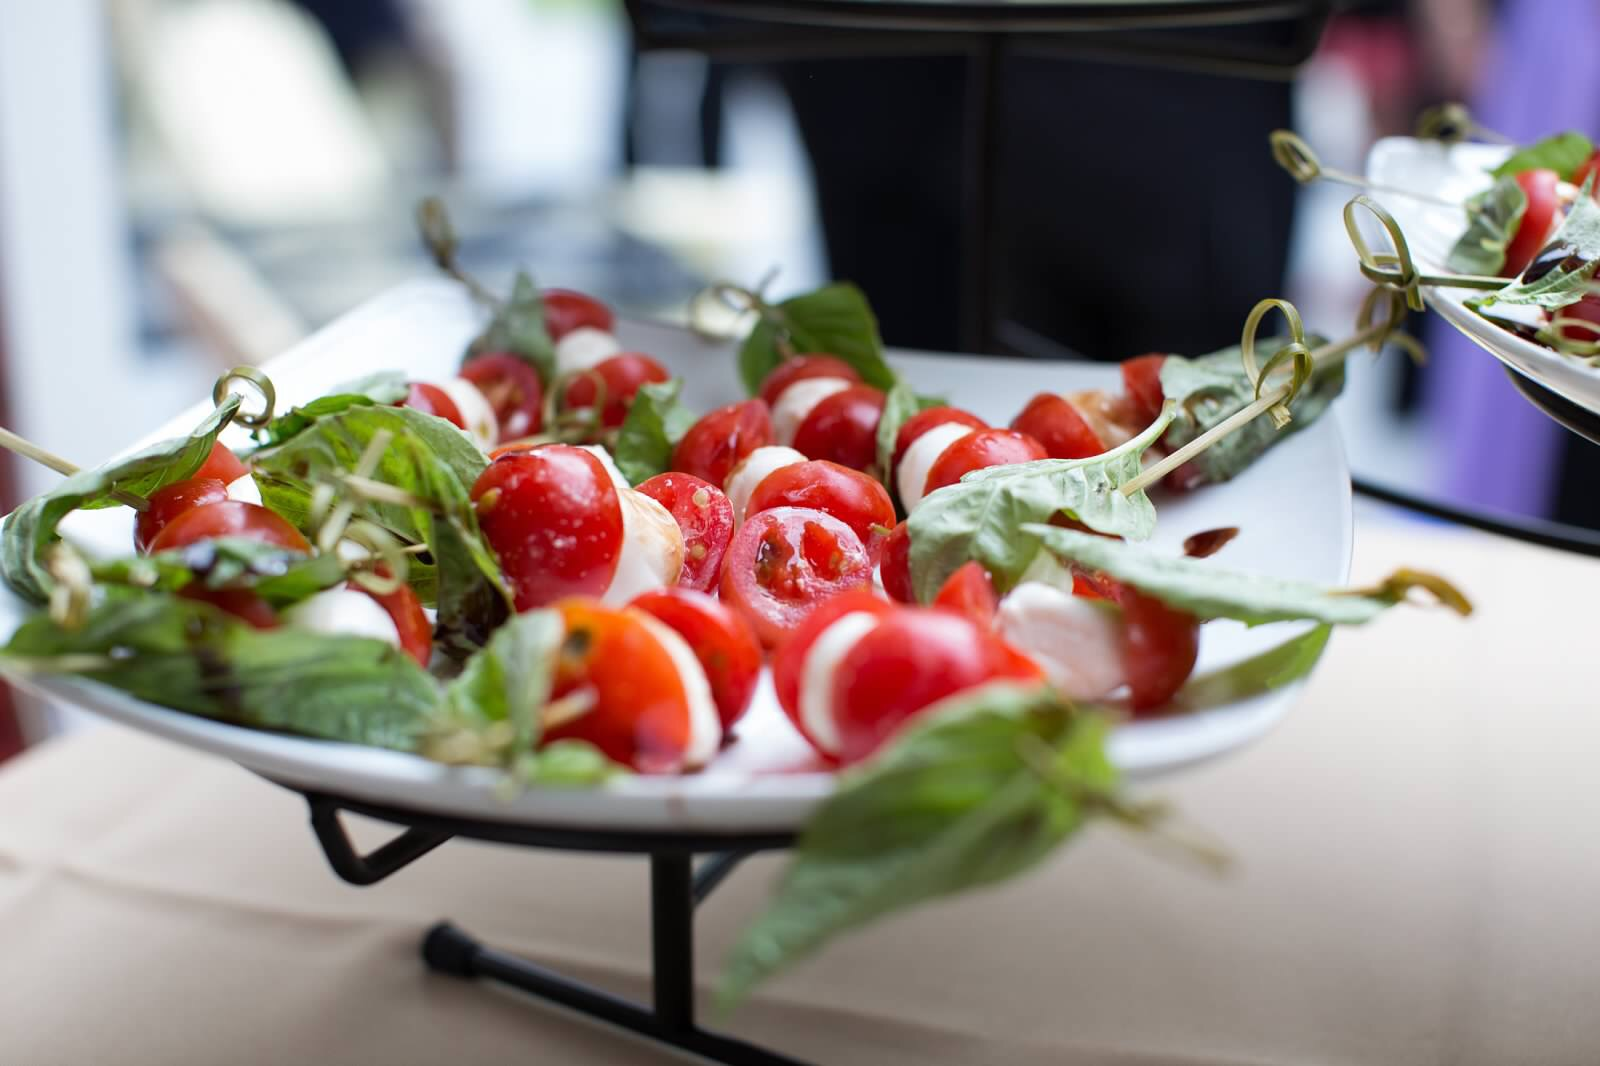 Tomatoes, mozzarella and bazil